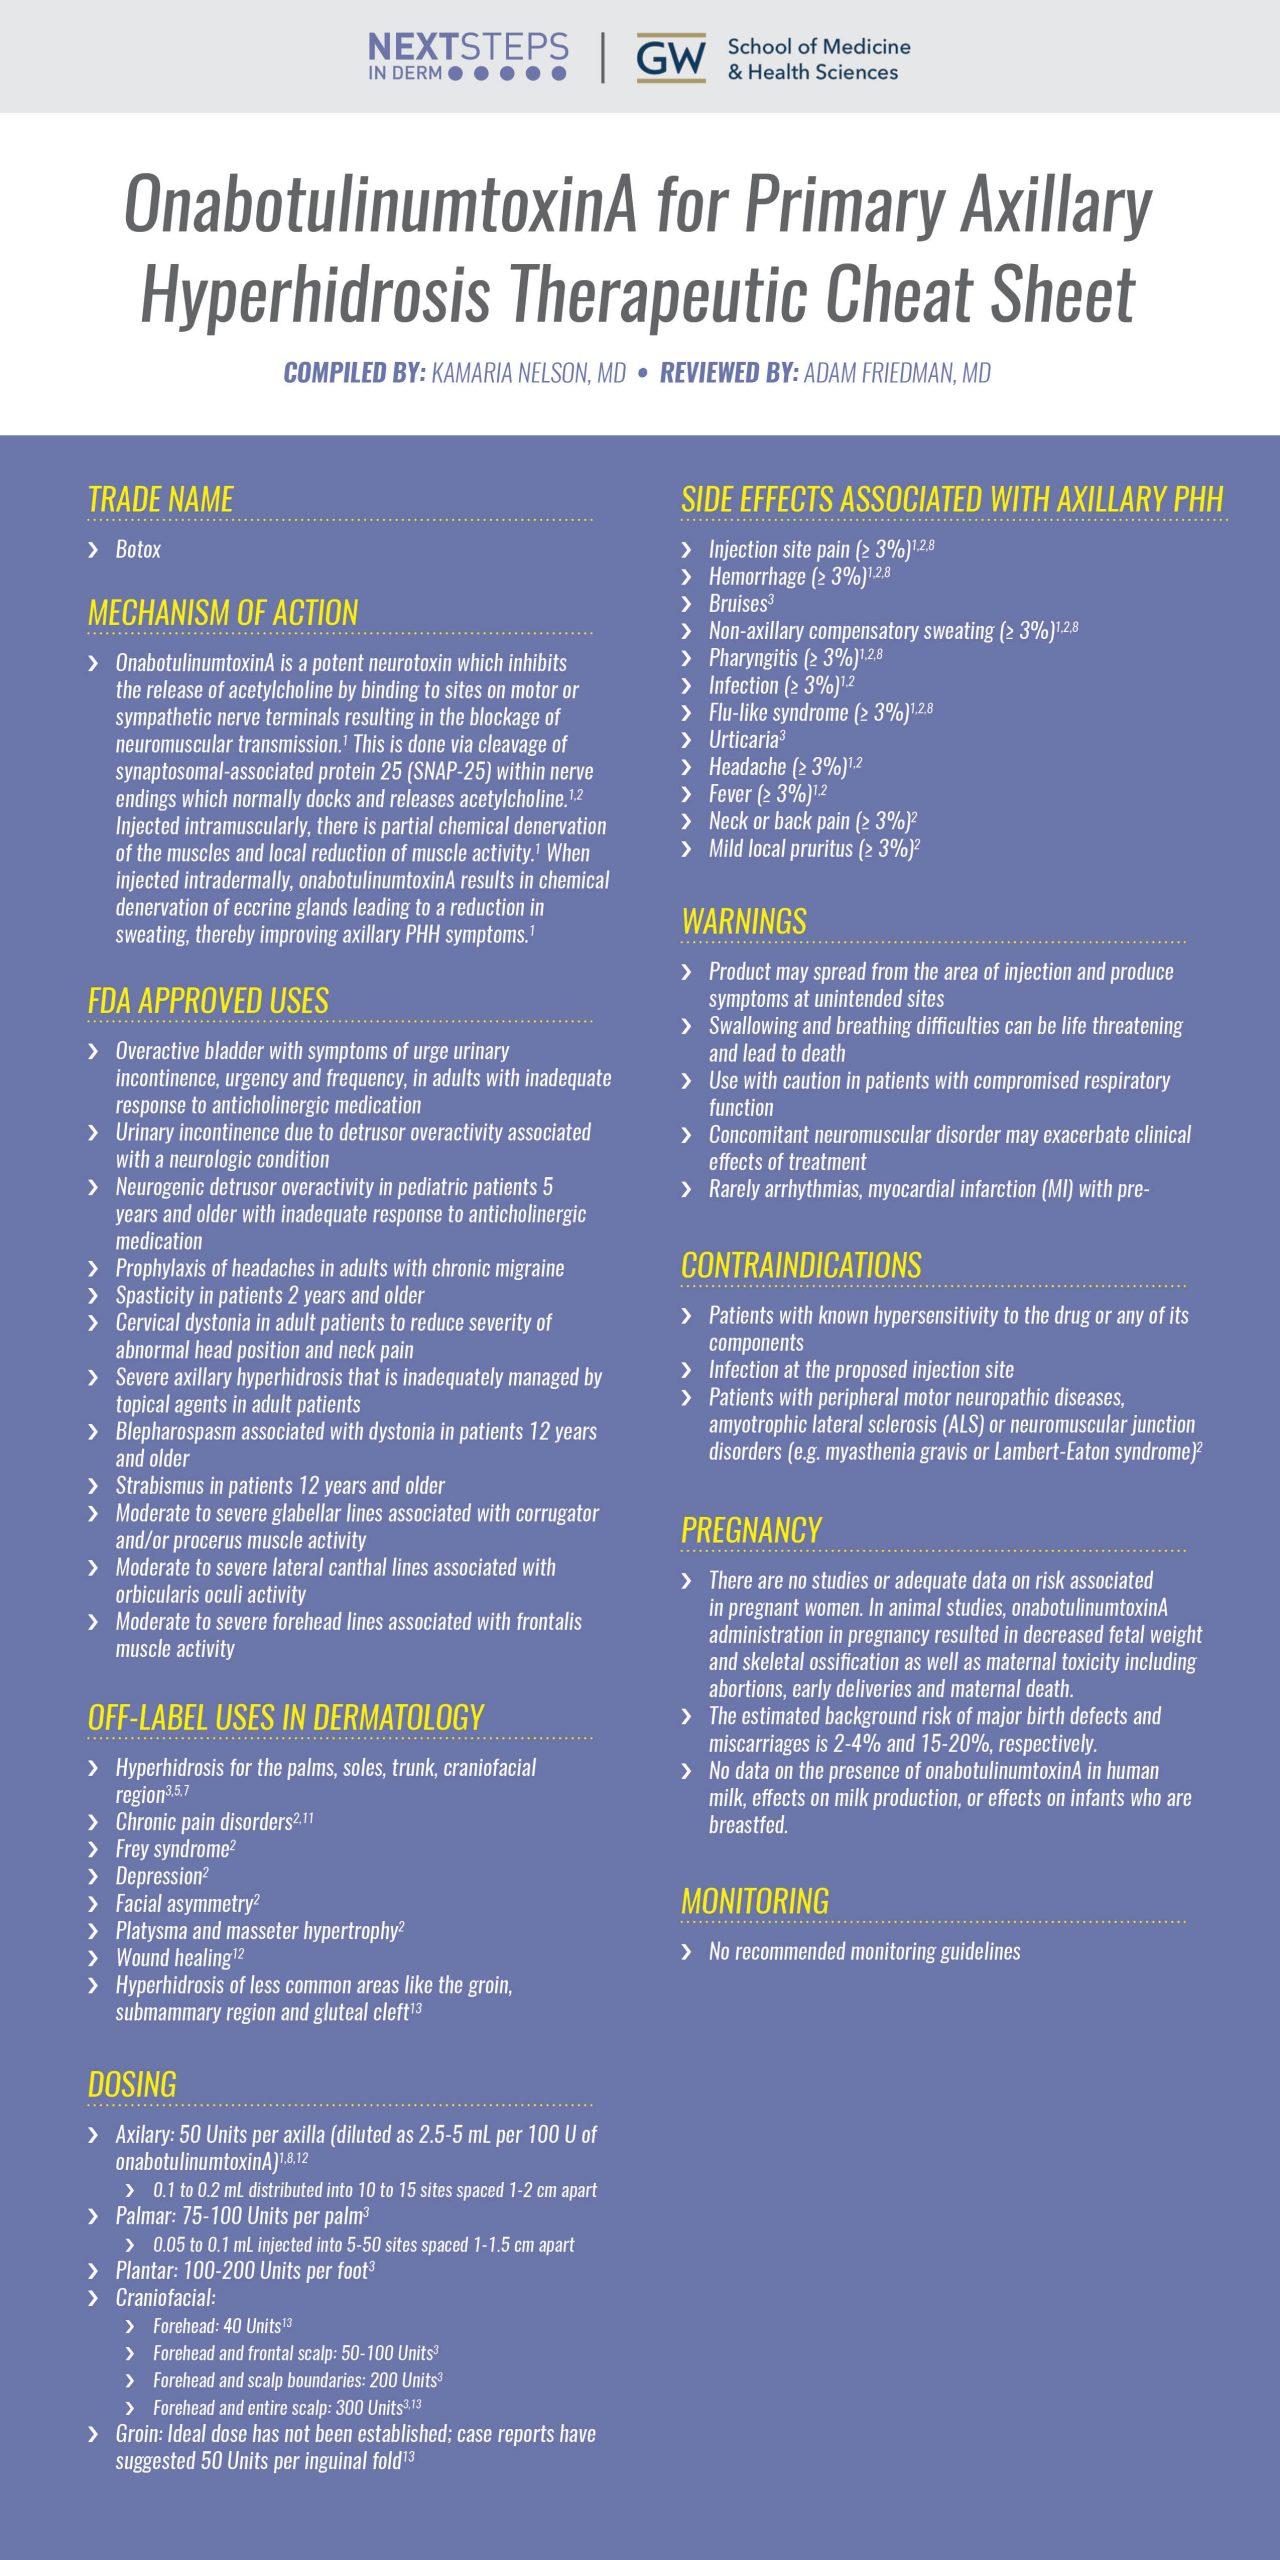 OnabotulinumtoxinA for Hyperhidrosis